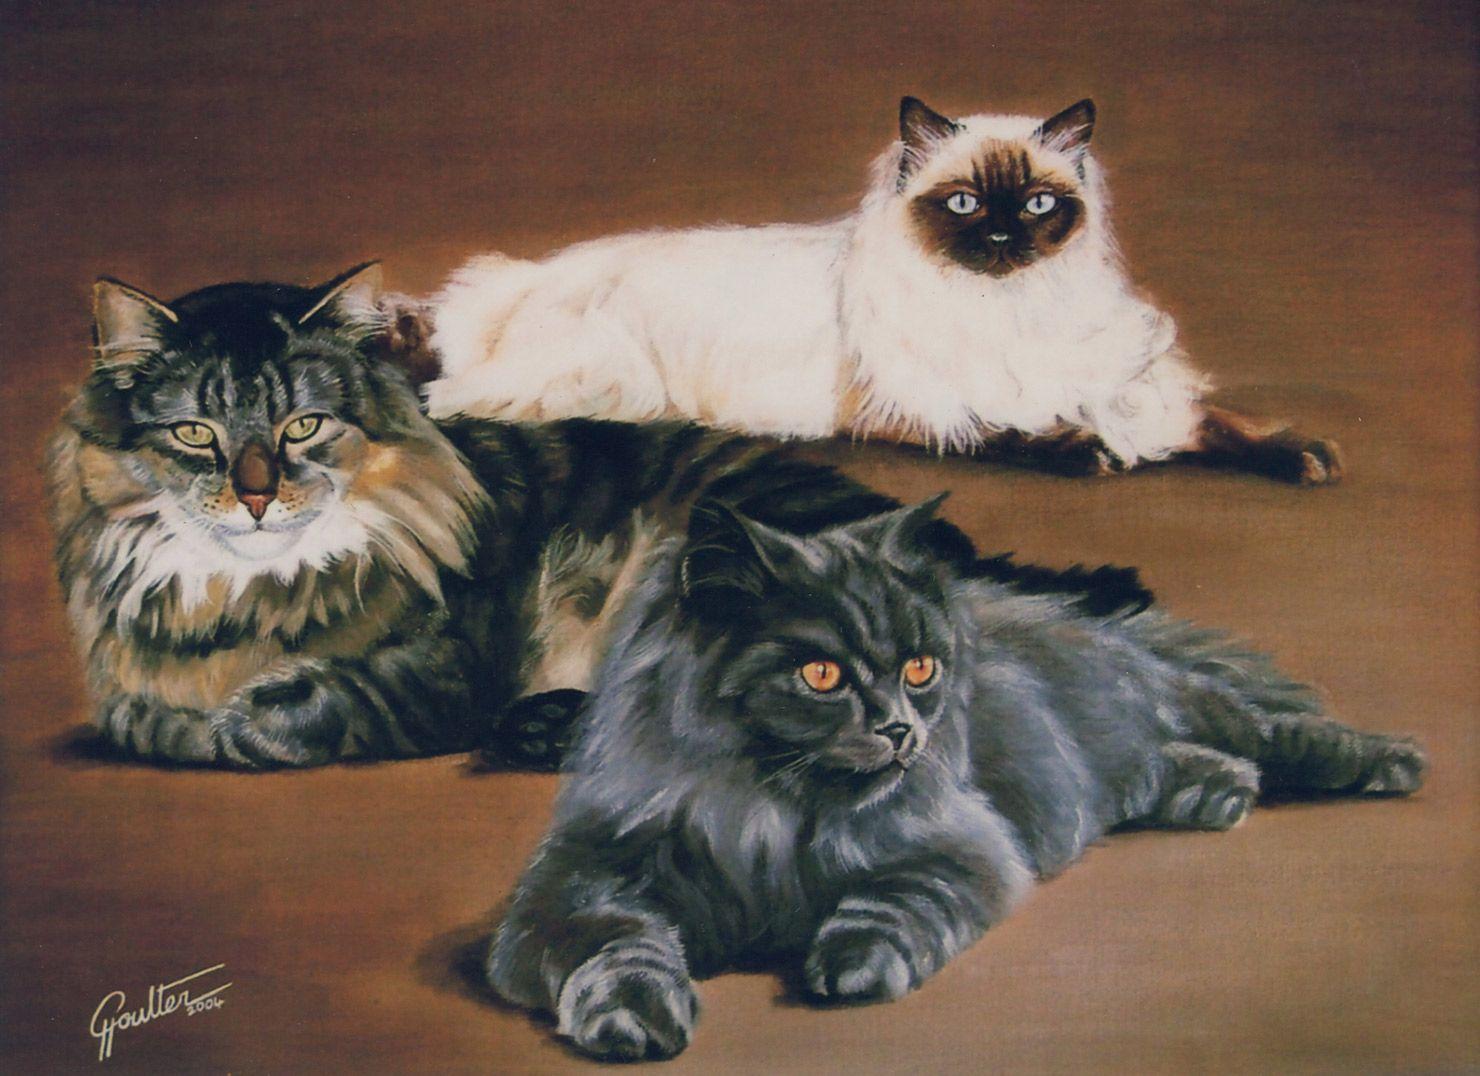 Mercuryenyaandkudarwg art cats and other